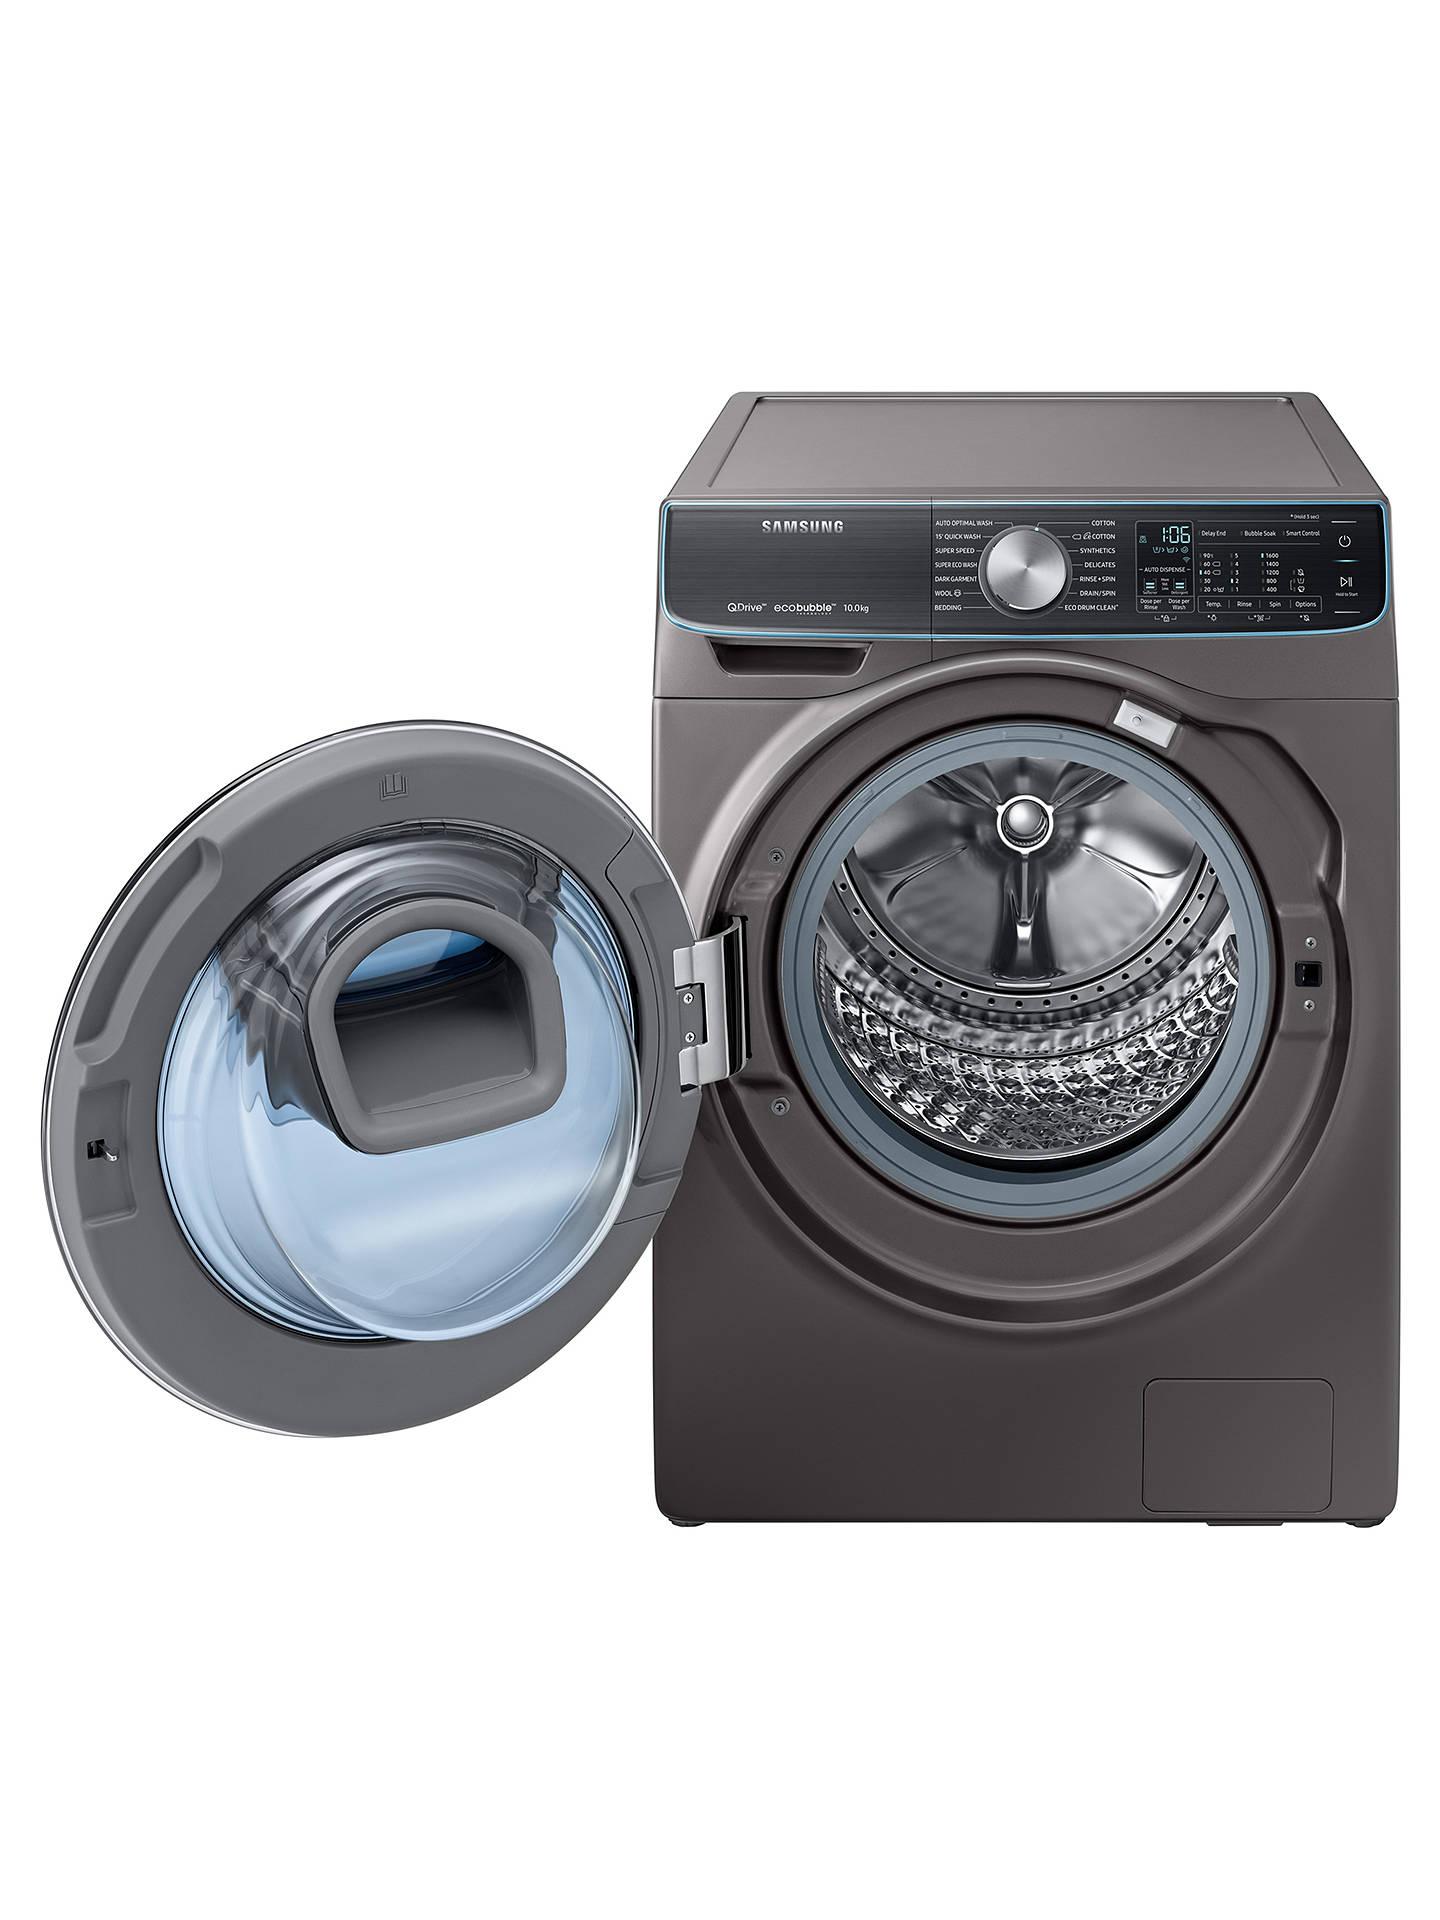 Samsung WW10M86DQOO/EU Freestanding QuickDrive Washing Machine, 10kg Load,  A+++ Energy Rating, 1600rpm Spin, Graphite